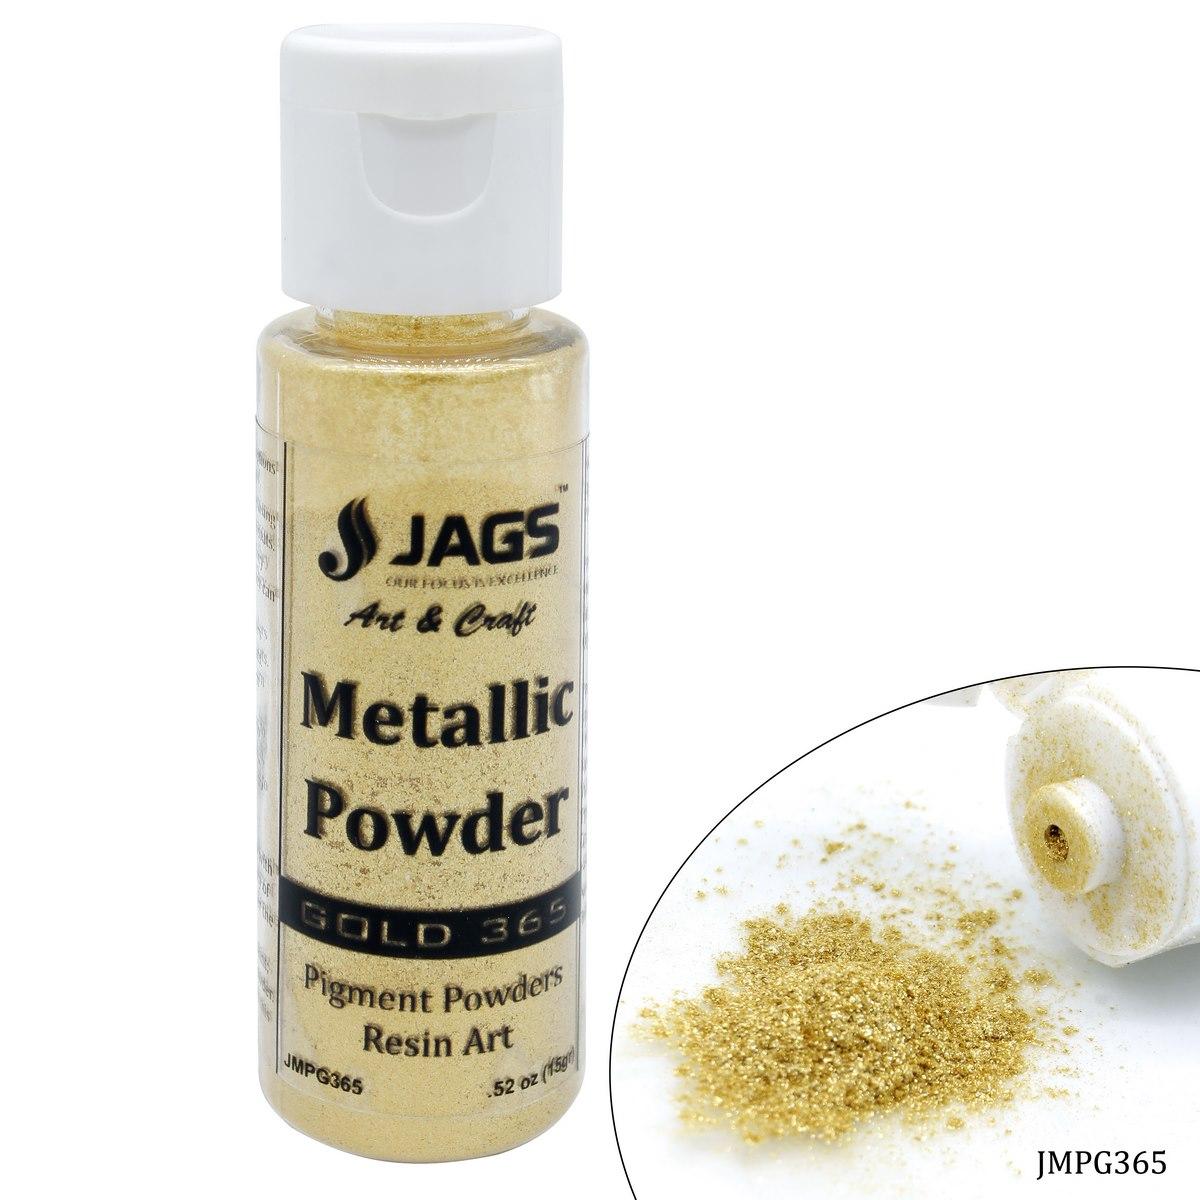 Jags Metallic Powder Gold 365 15Gms JMPG365